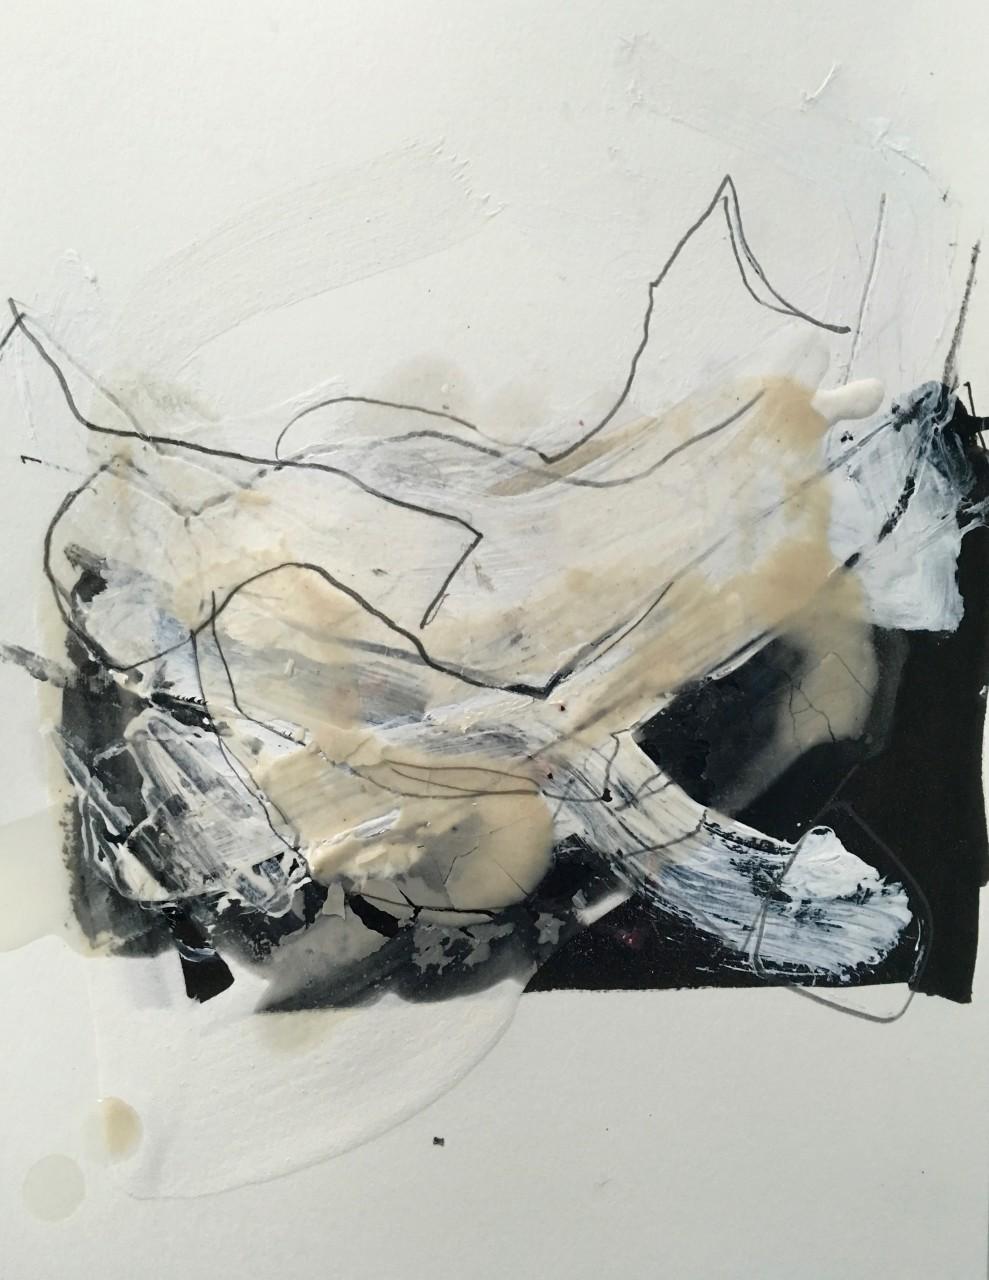 ecce homo mixed media drawing on paper of fallen human figure